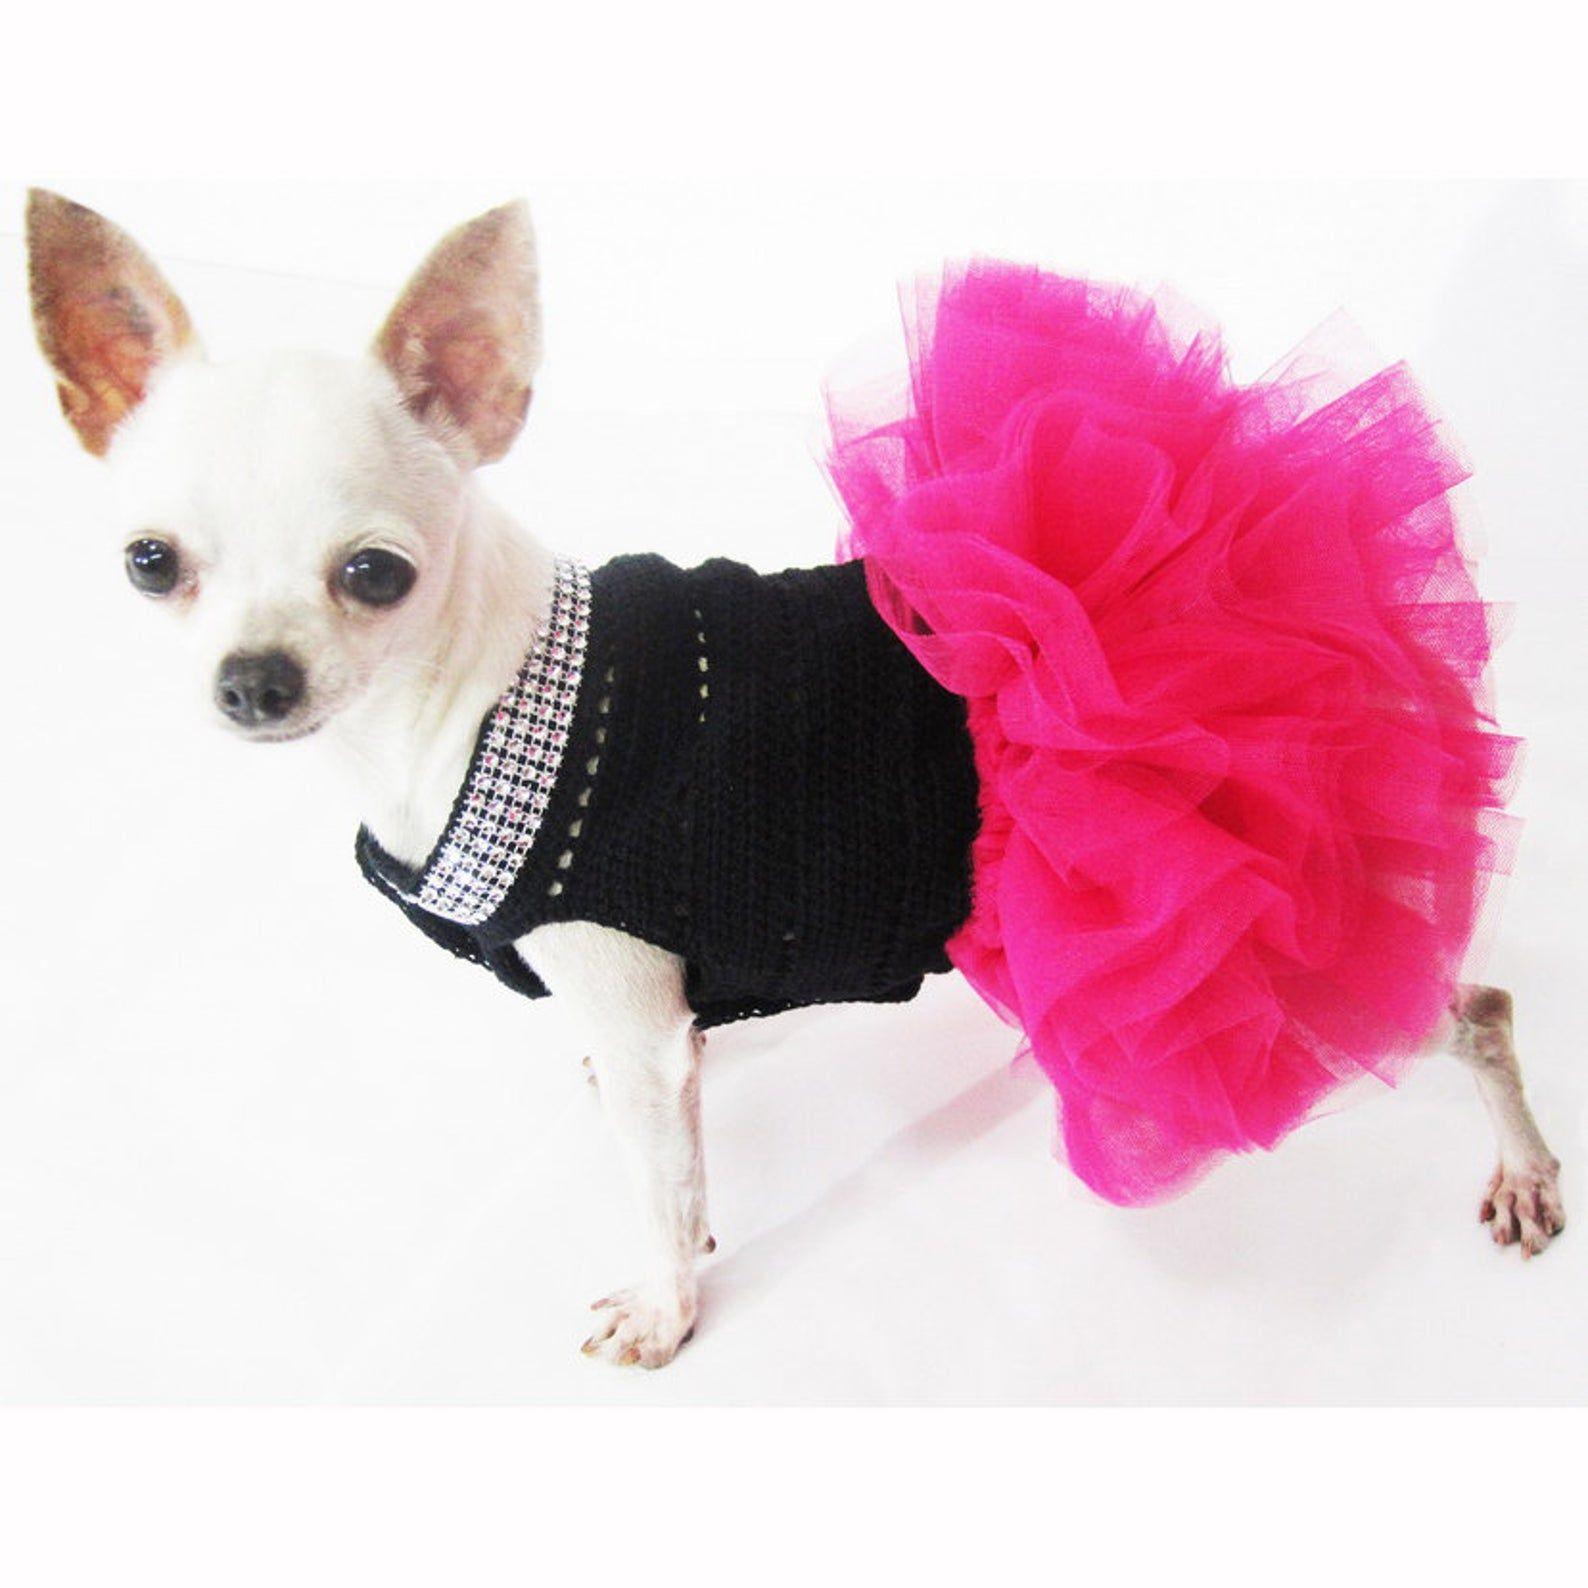 X Small Dog Sweater  Hand Knit,black and silver Dog Jacket XS  Dog Coat  Dog Apparel  XS Dog Clothing  Dog AttireDog Wear  Dog Outfit